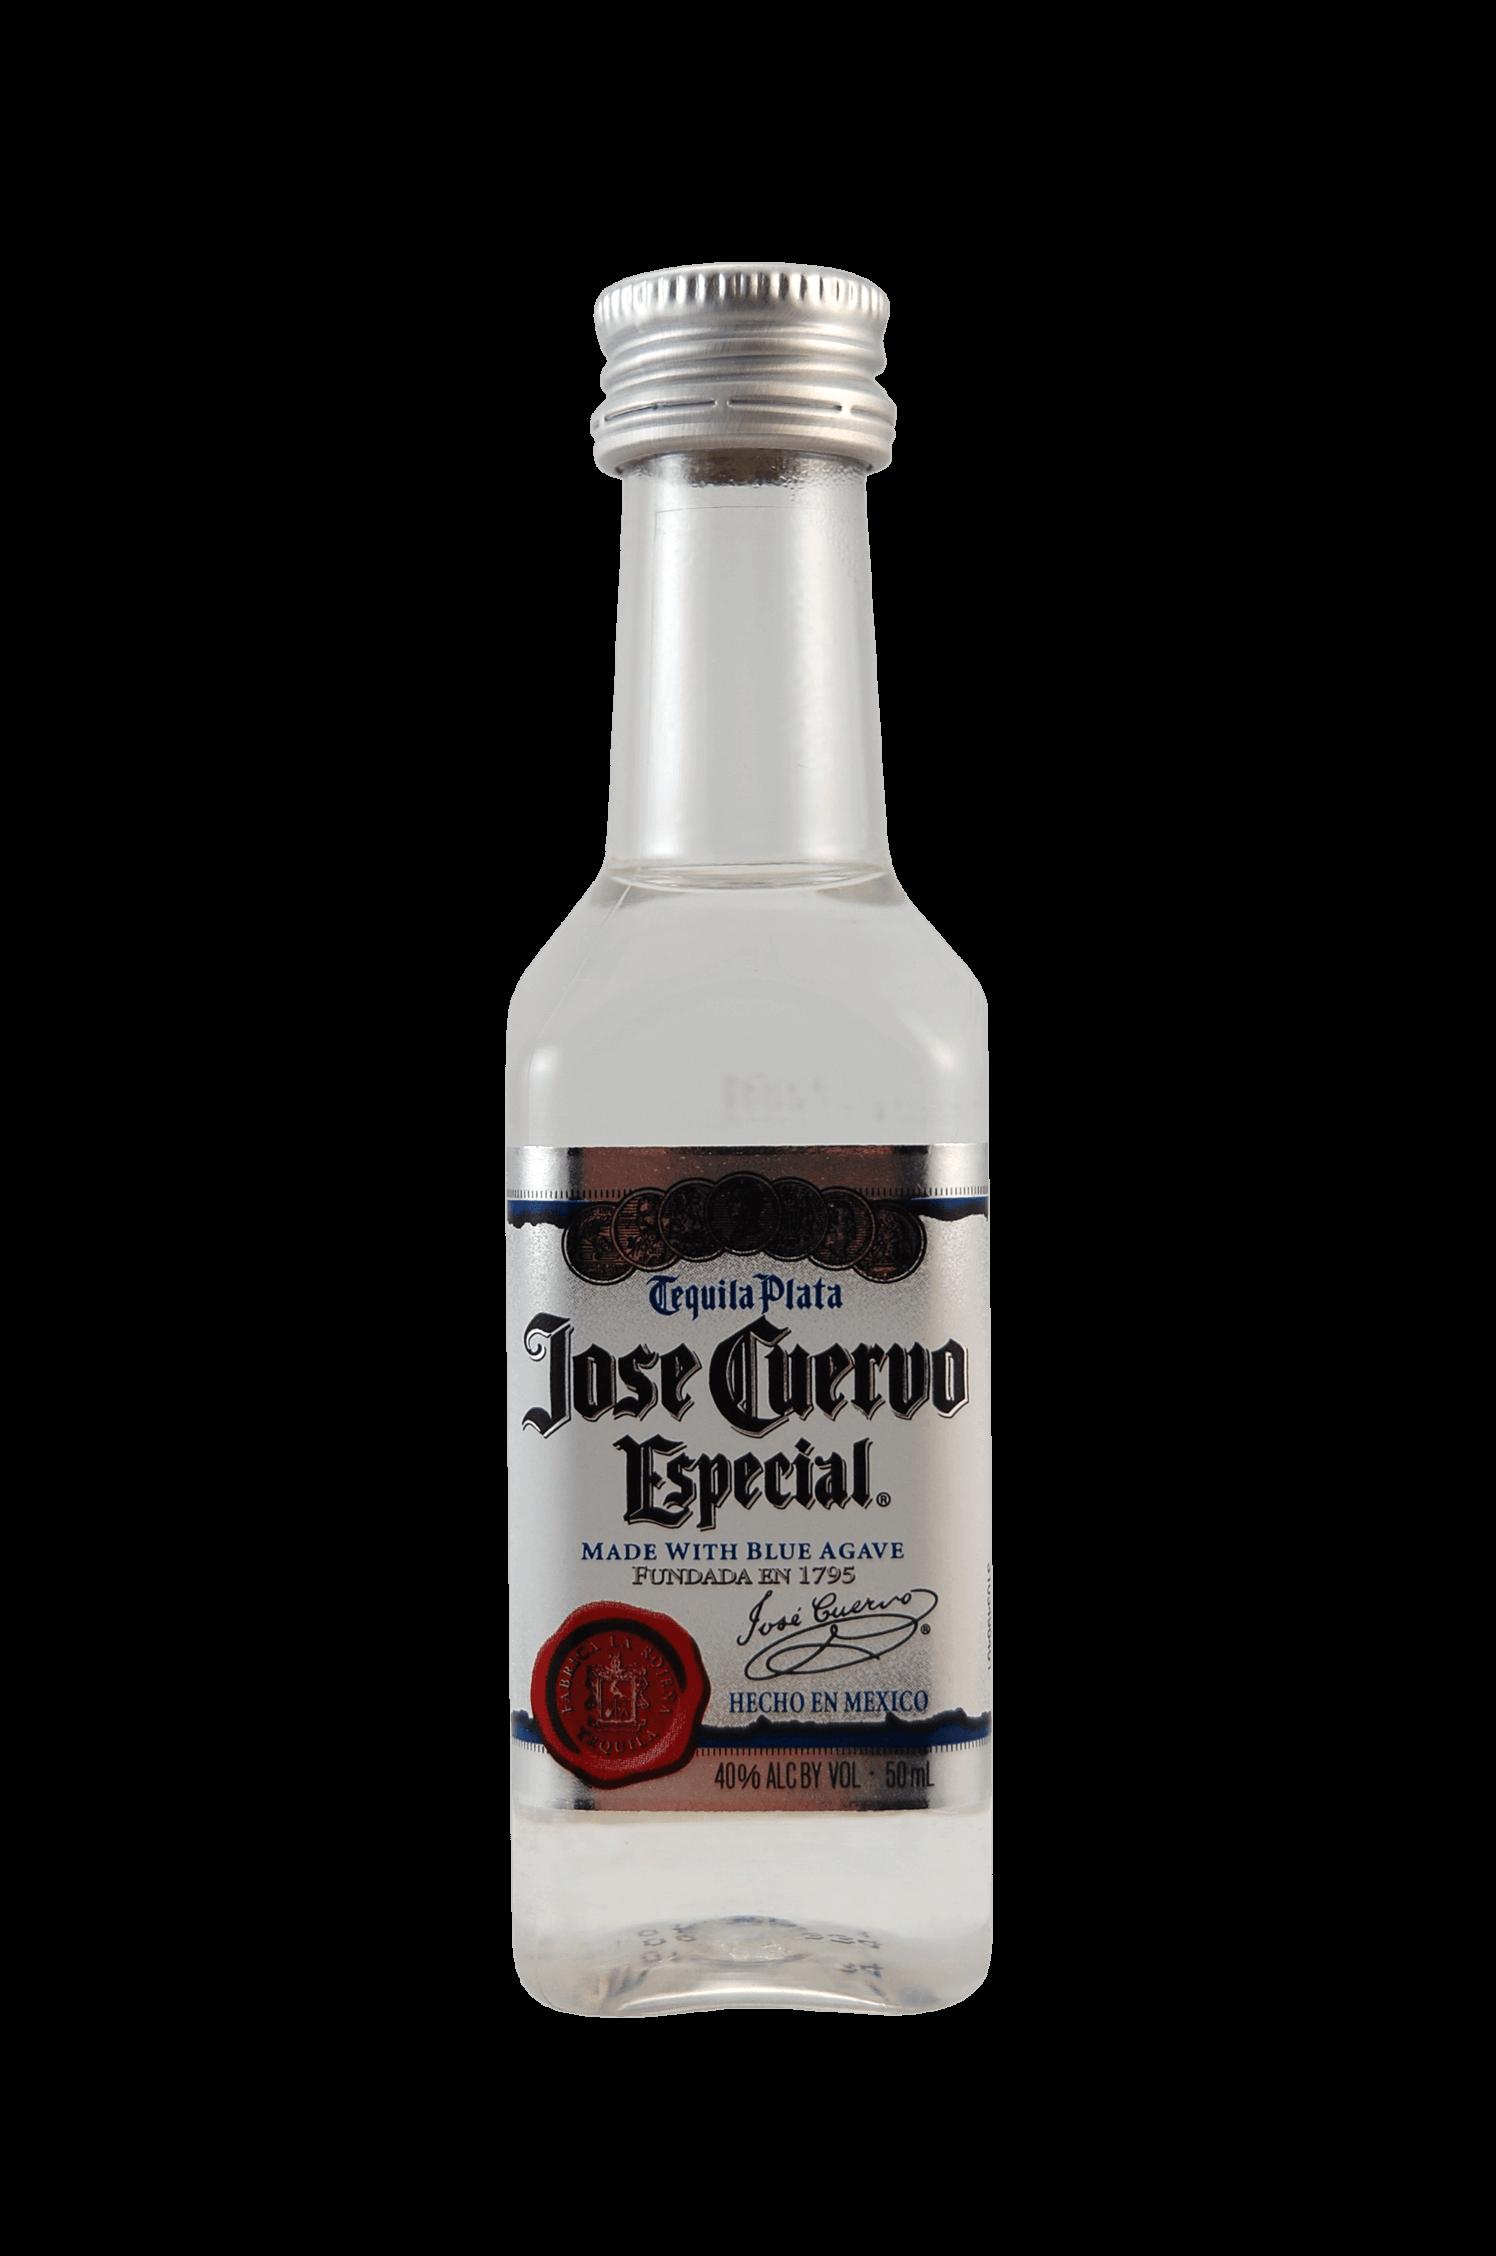 Jose Cuervo Especial Tequila Plata